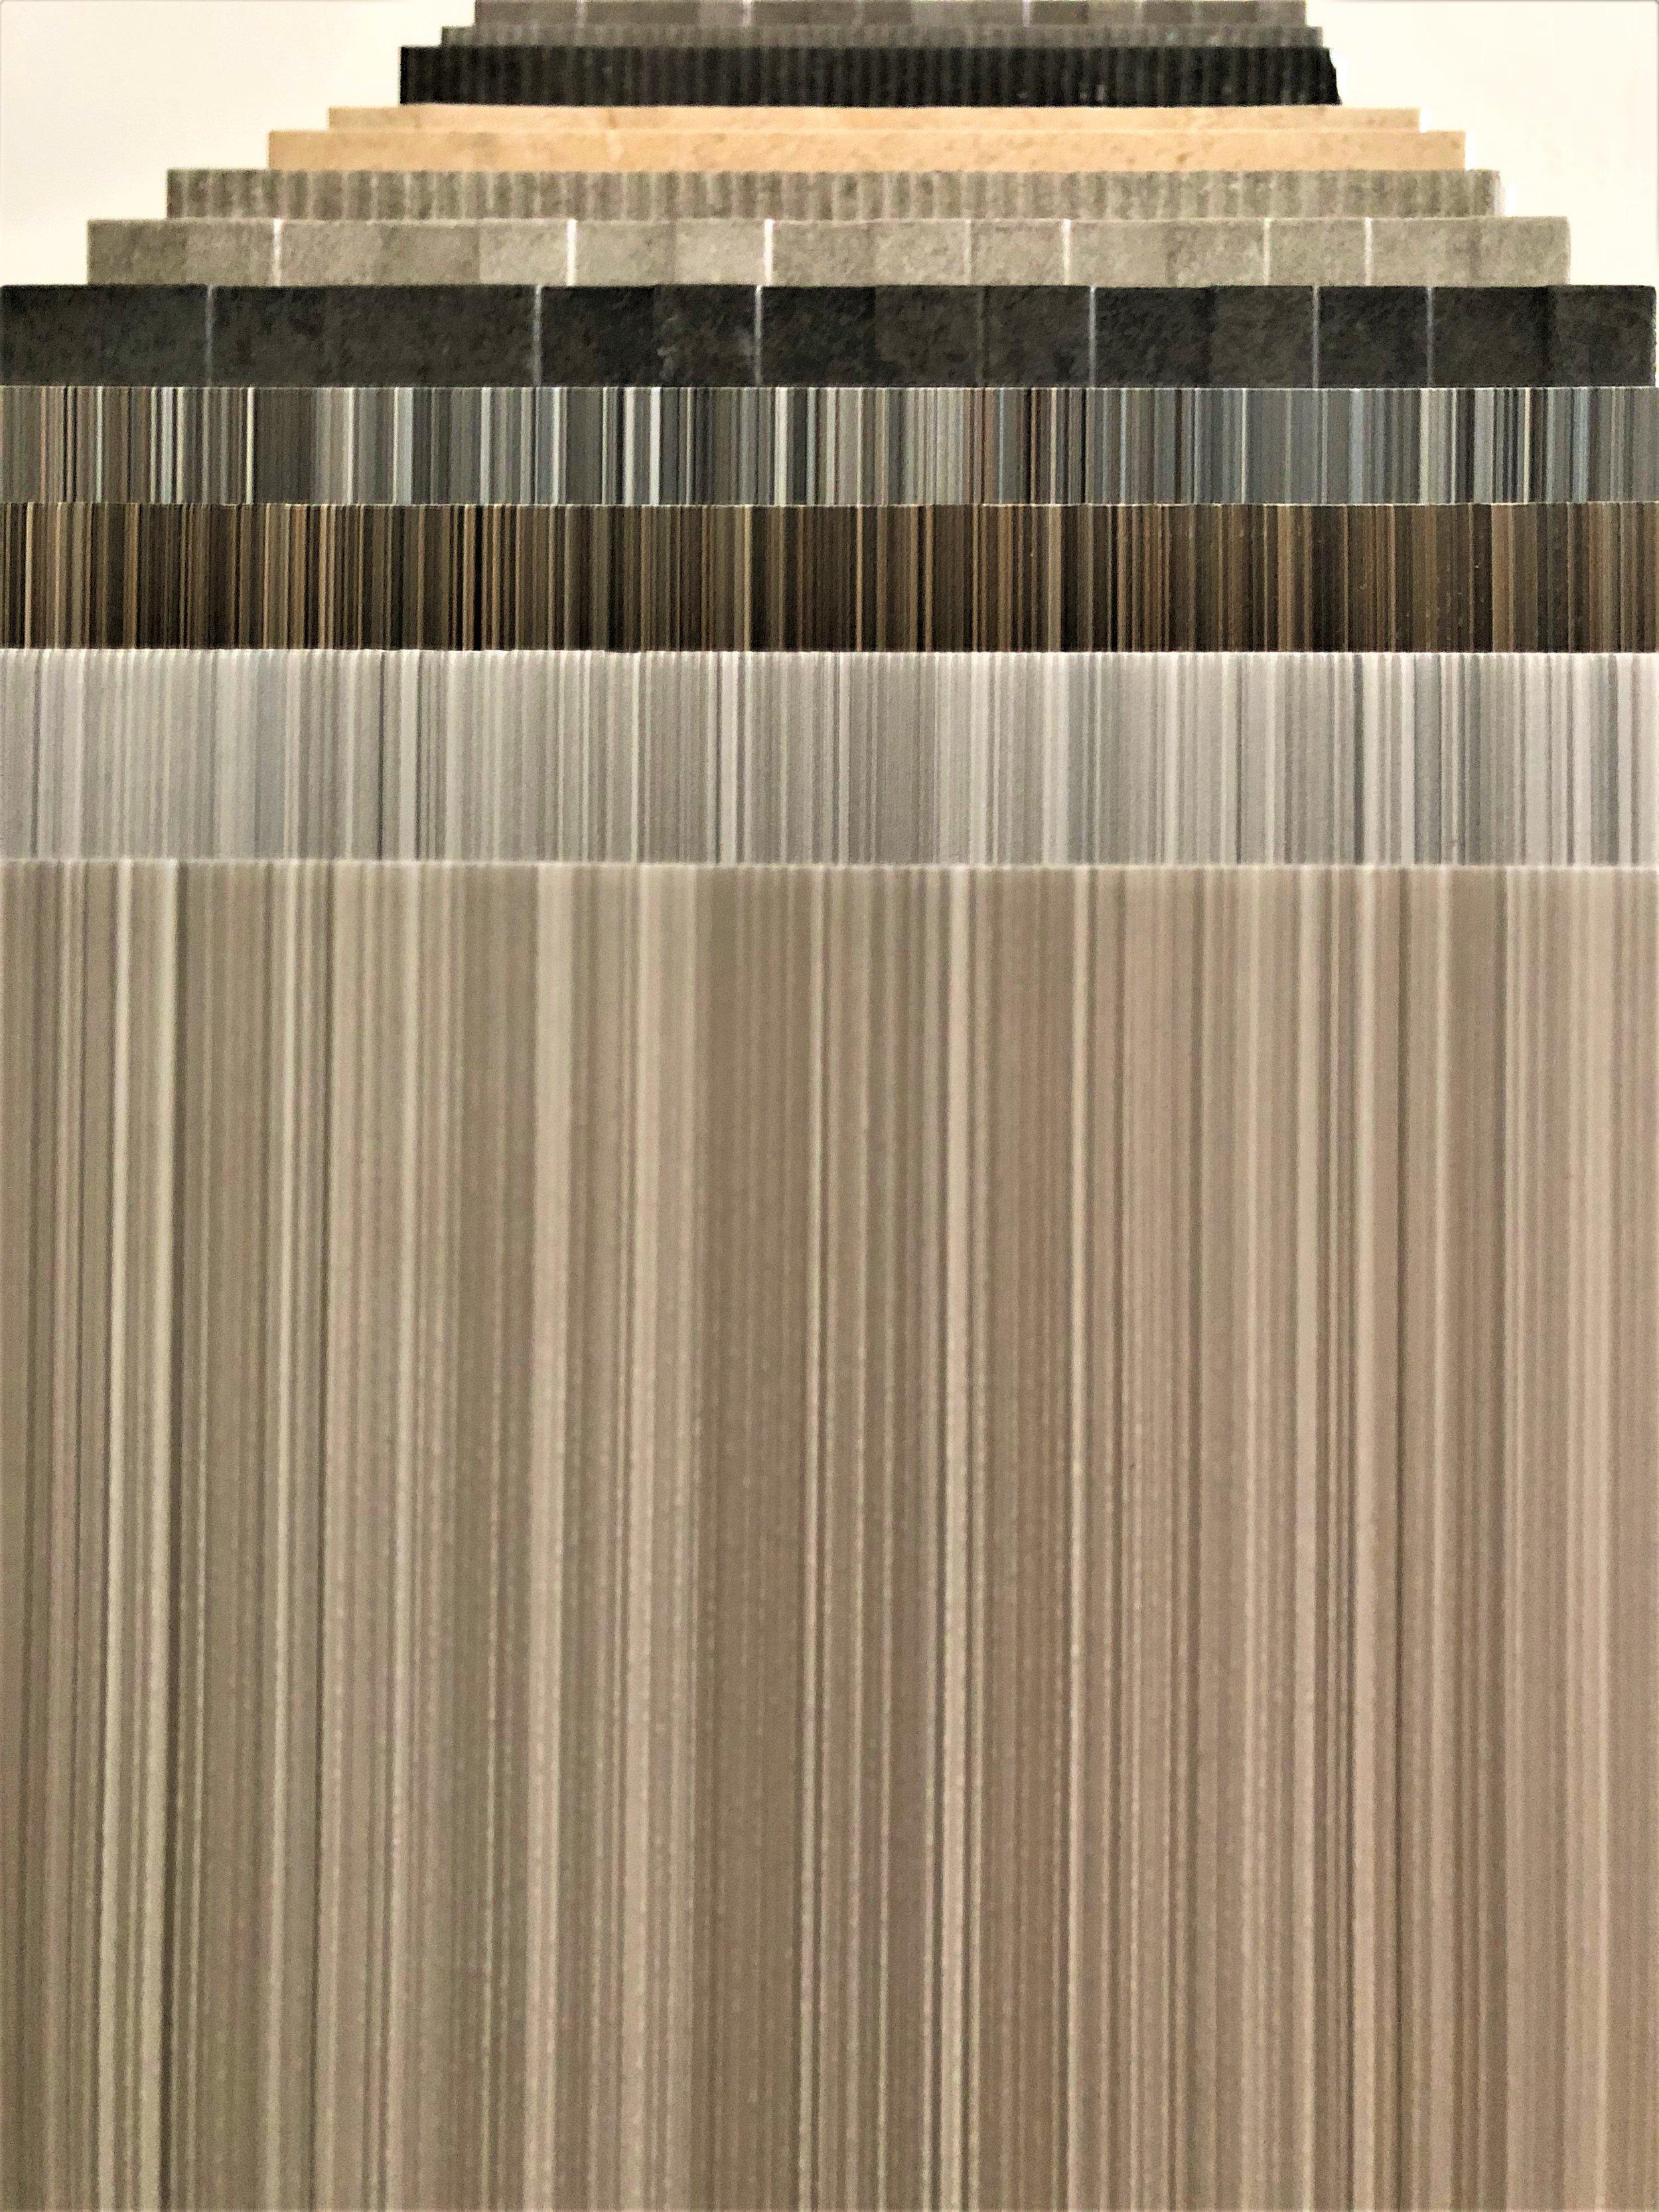 Tile design sample